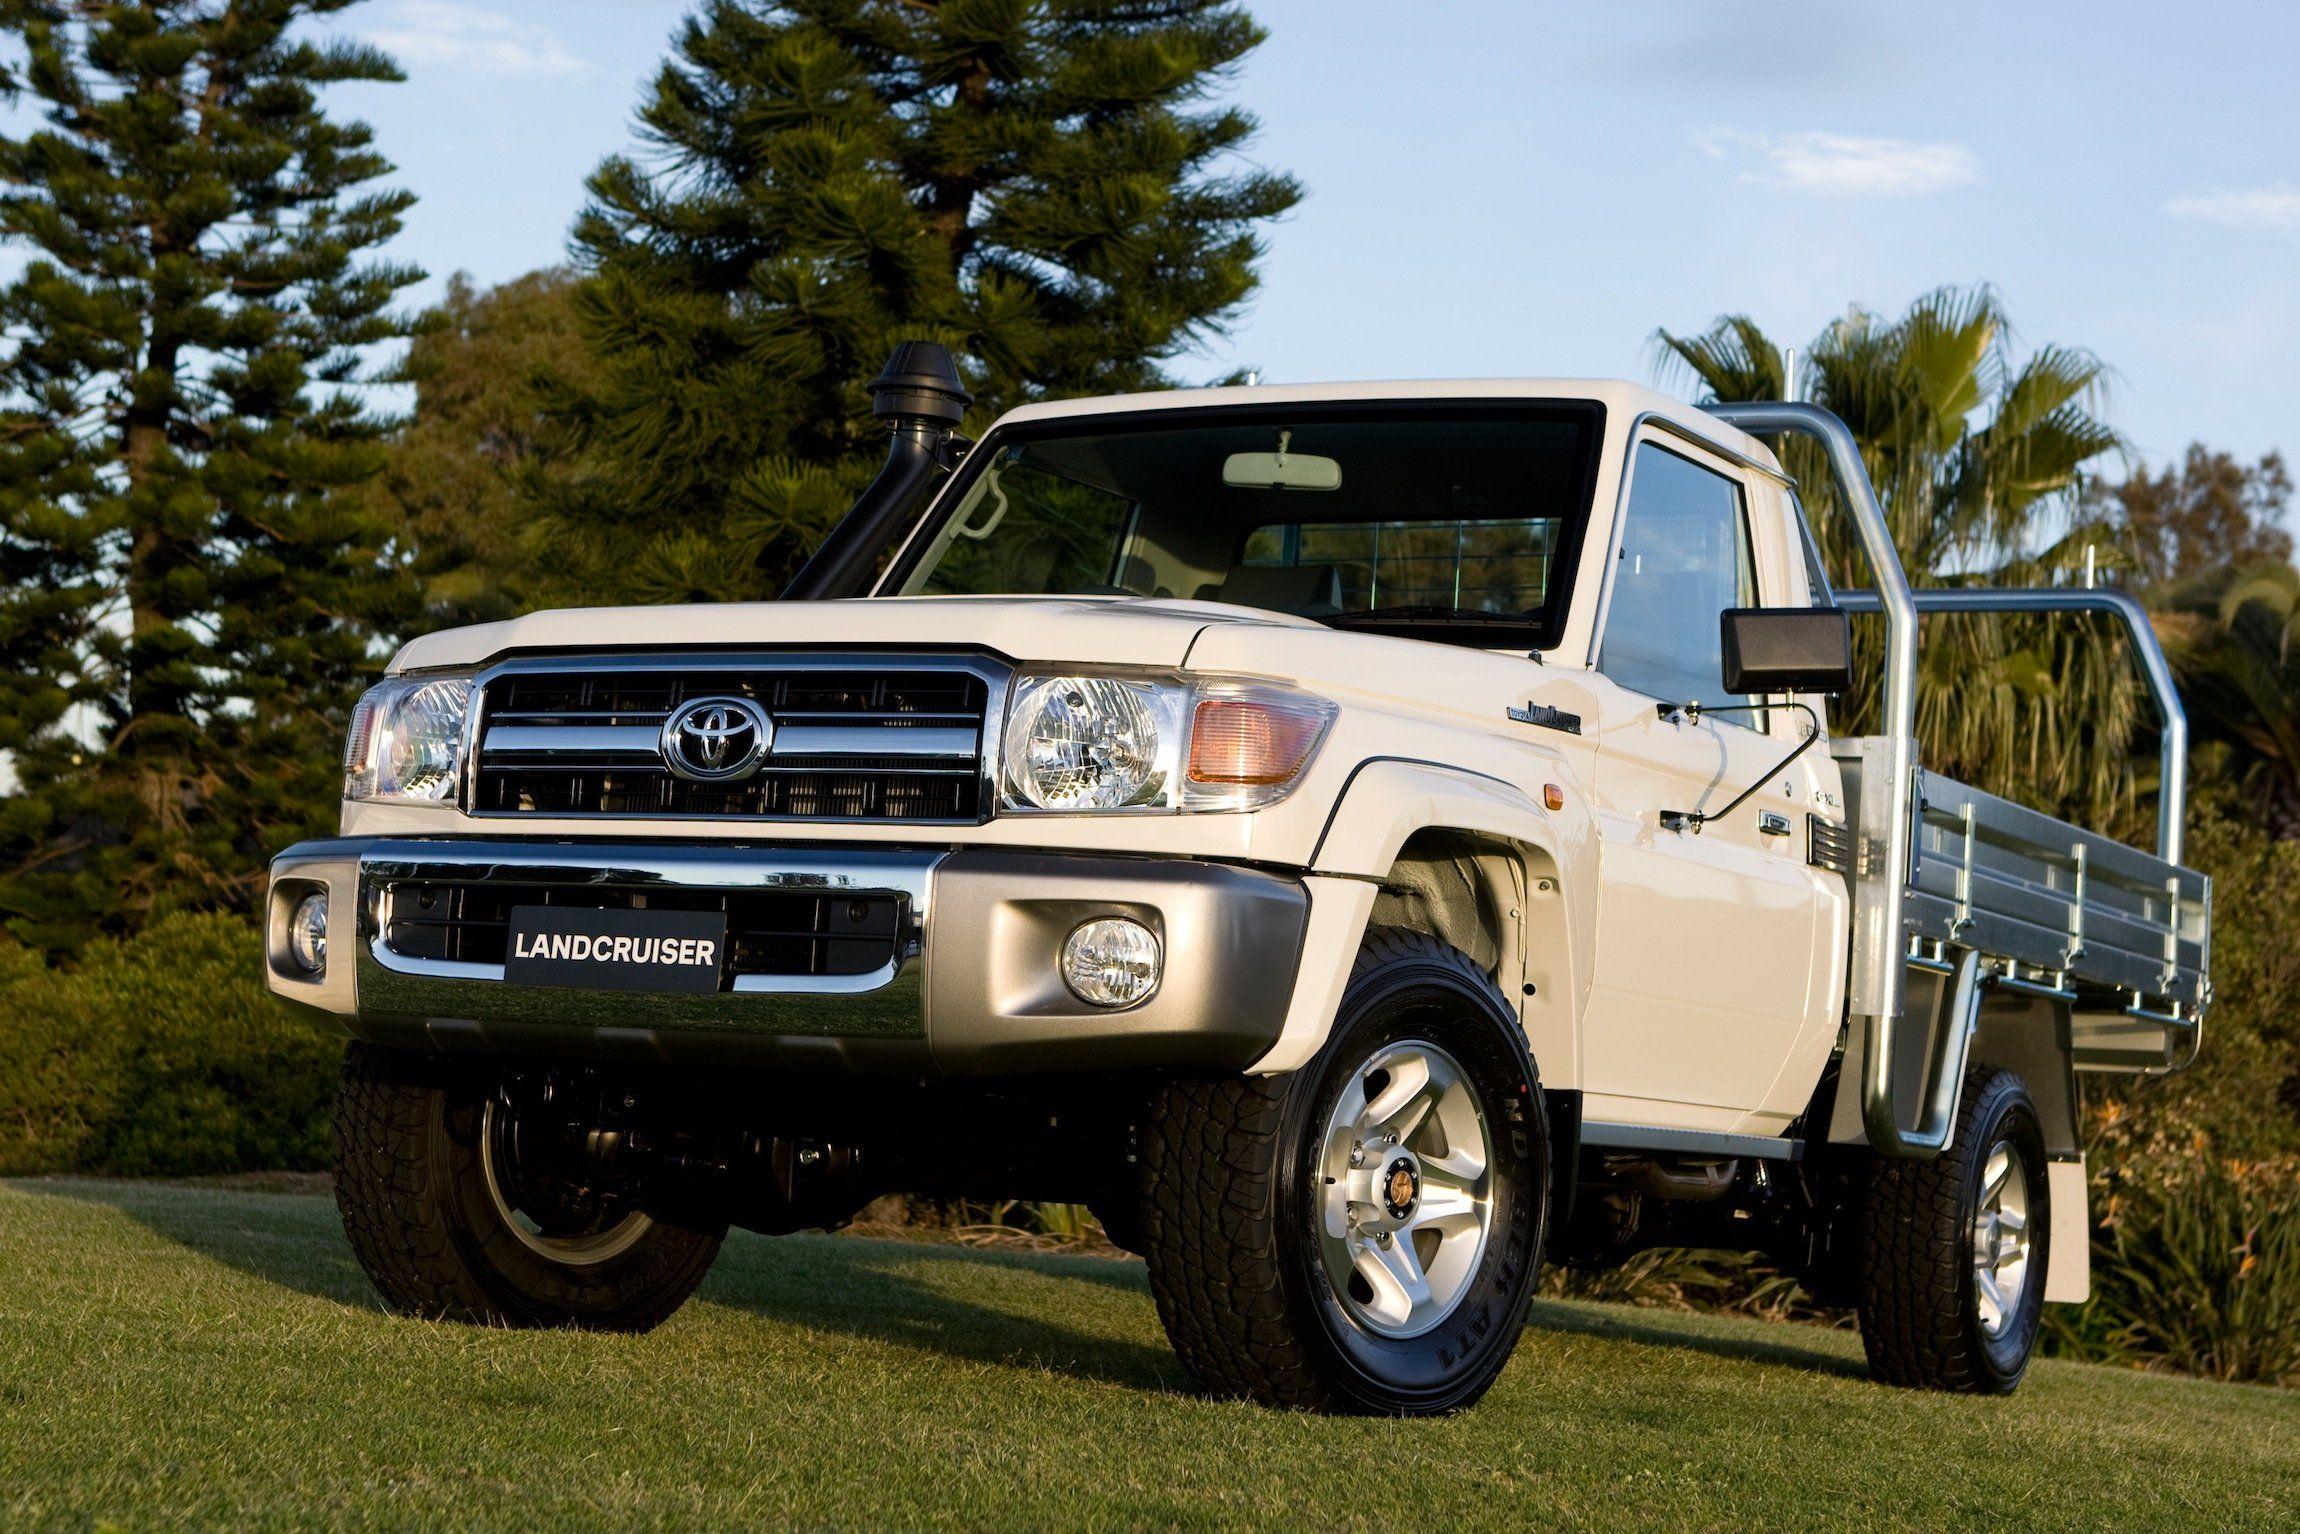 Toyota Landcruiser 70 Series Dual Cab Ute Coming Photos 1 Of 3